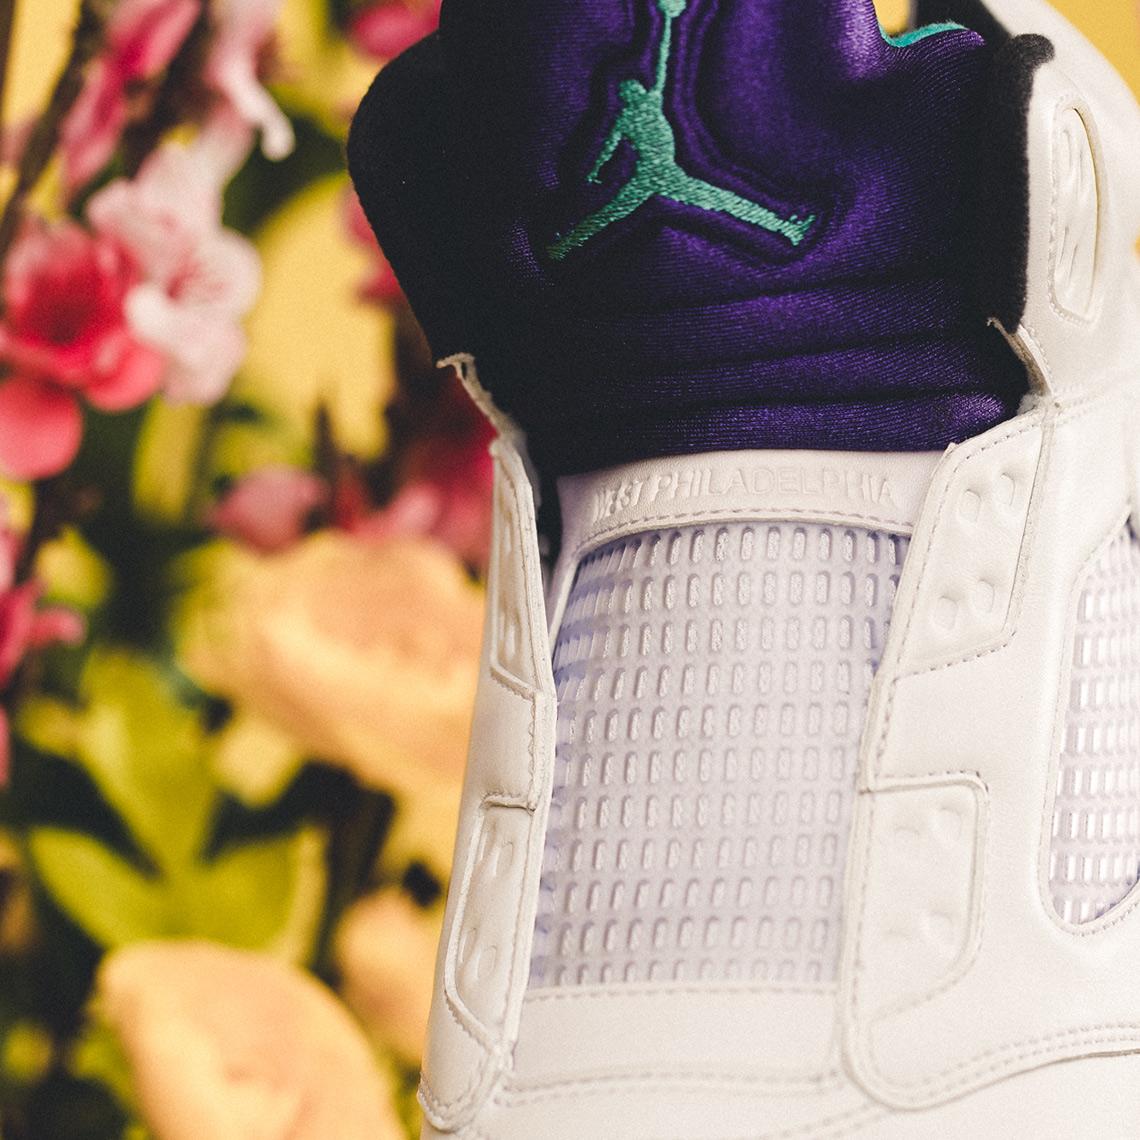 online store 2f1d5 114ee Air Jordan 5 Fresh Prince Release Info + Photos ...